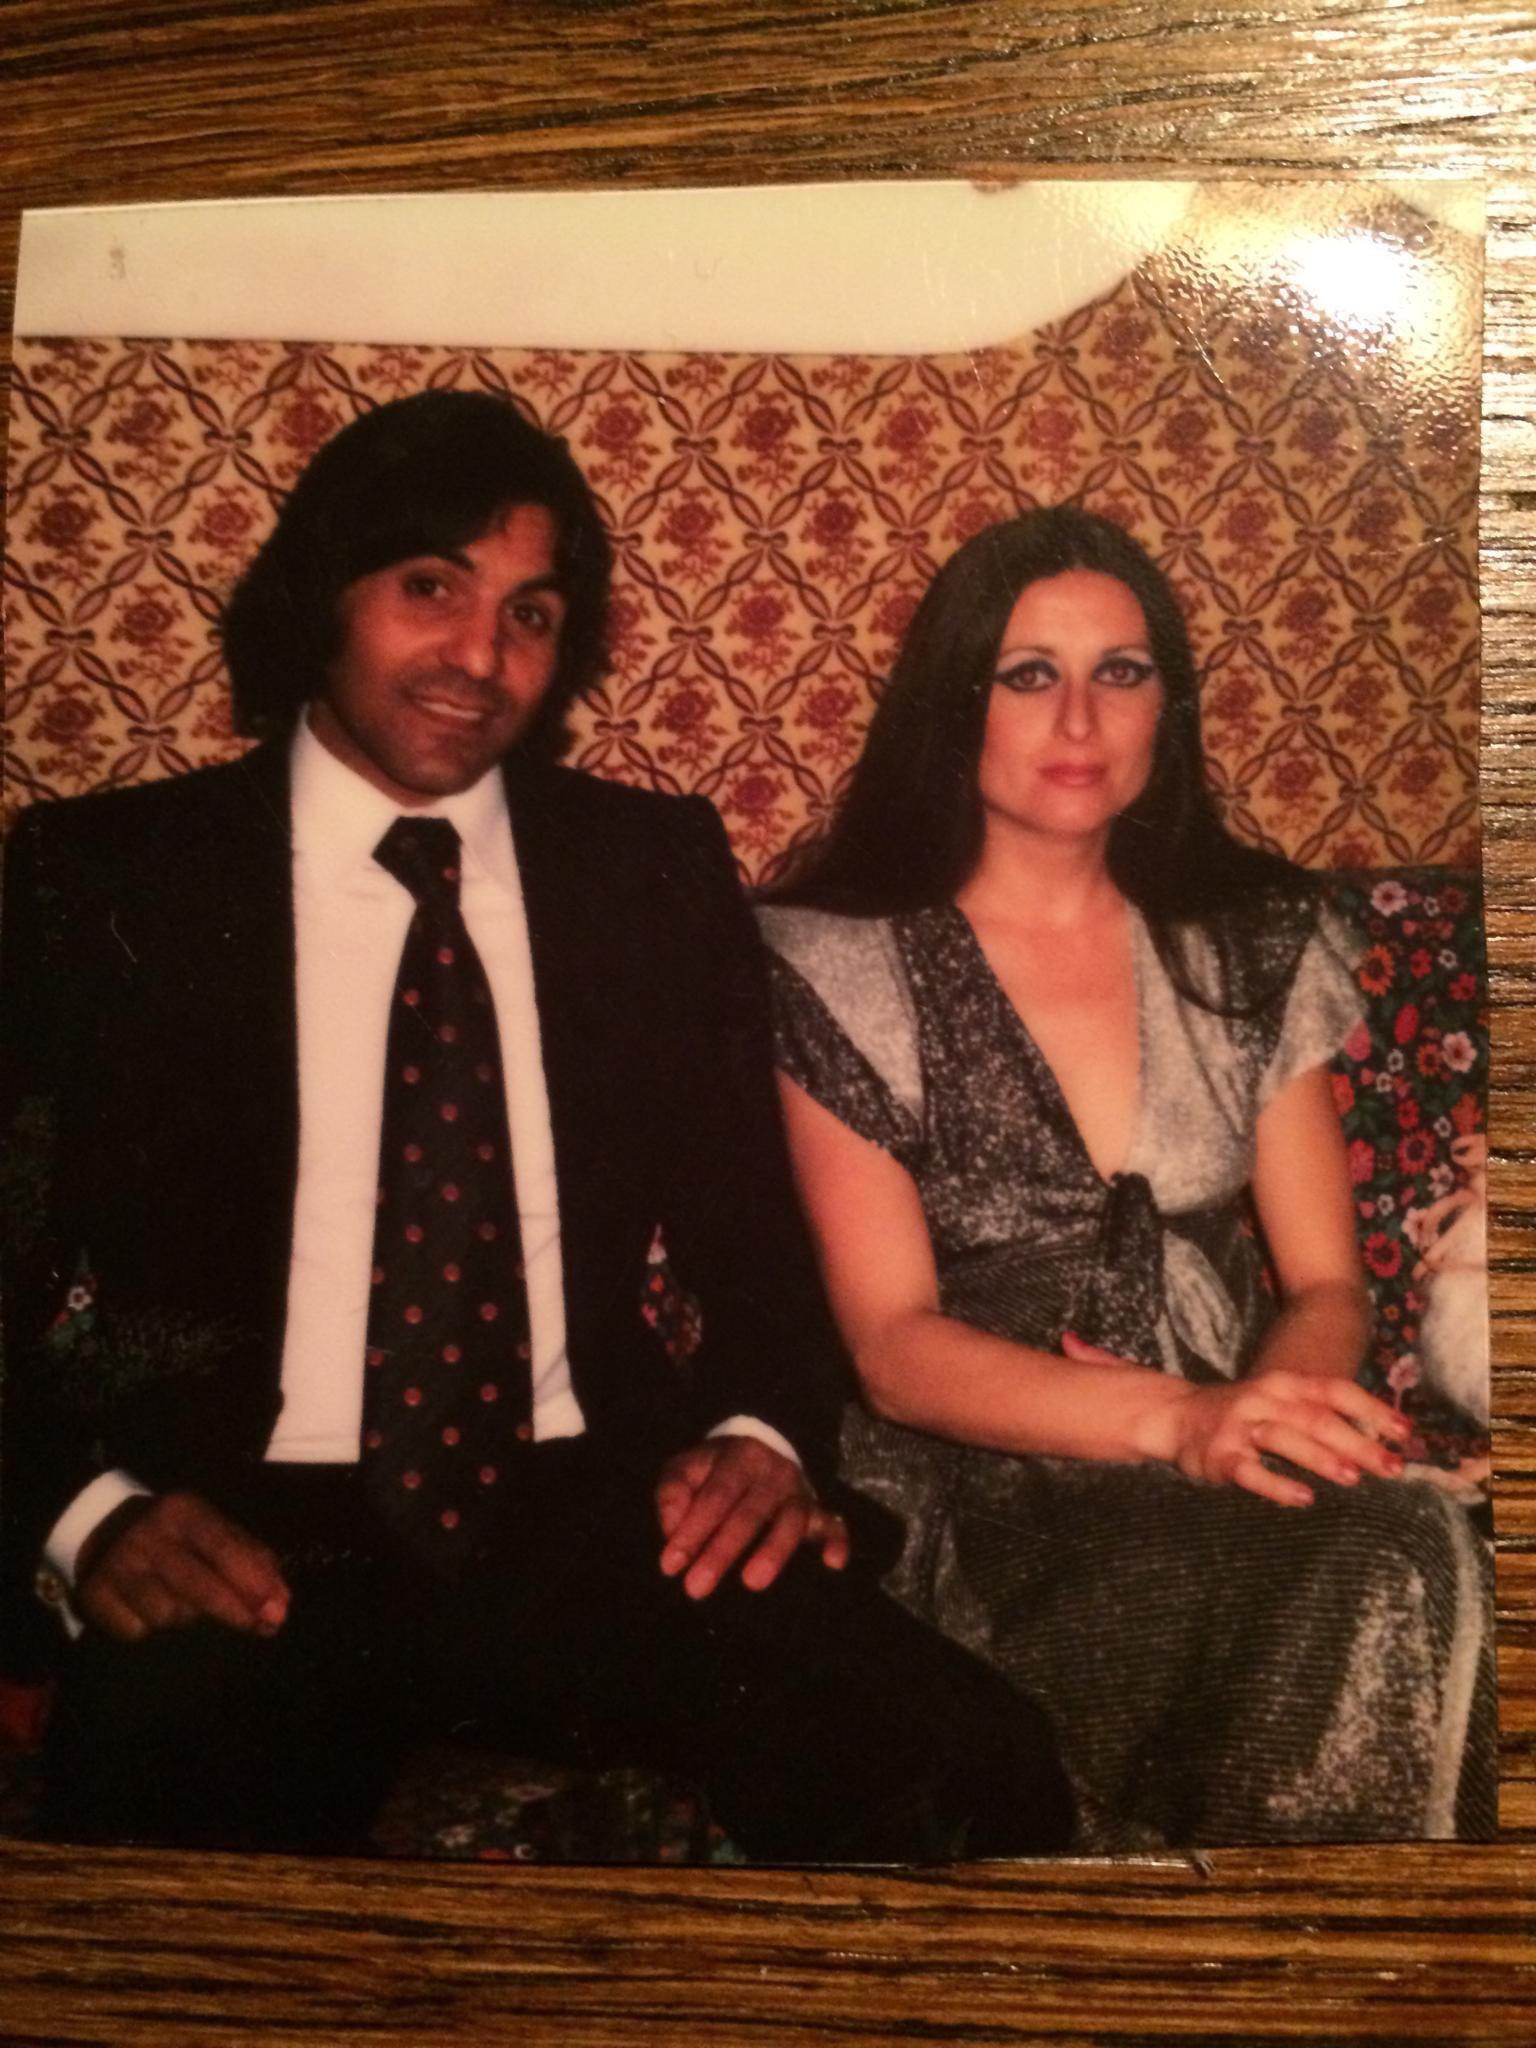 My parents in Spain, Sevilla, spring 1975 (dad spanish gipsy, mom